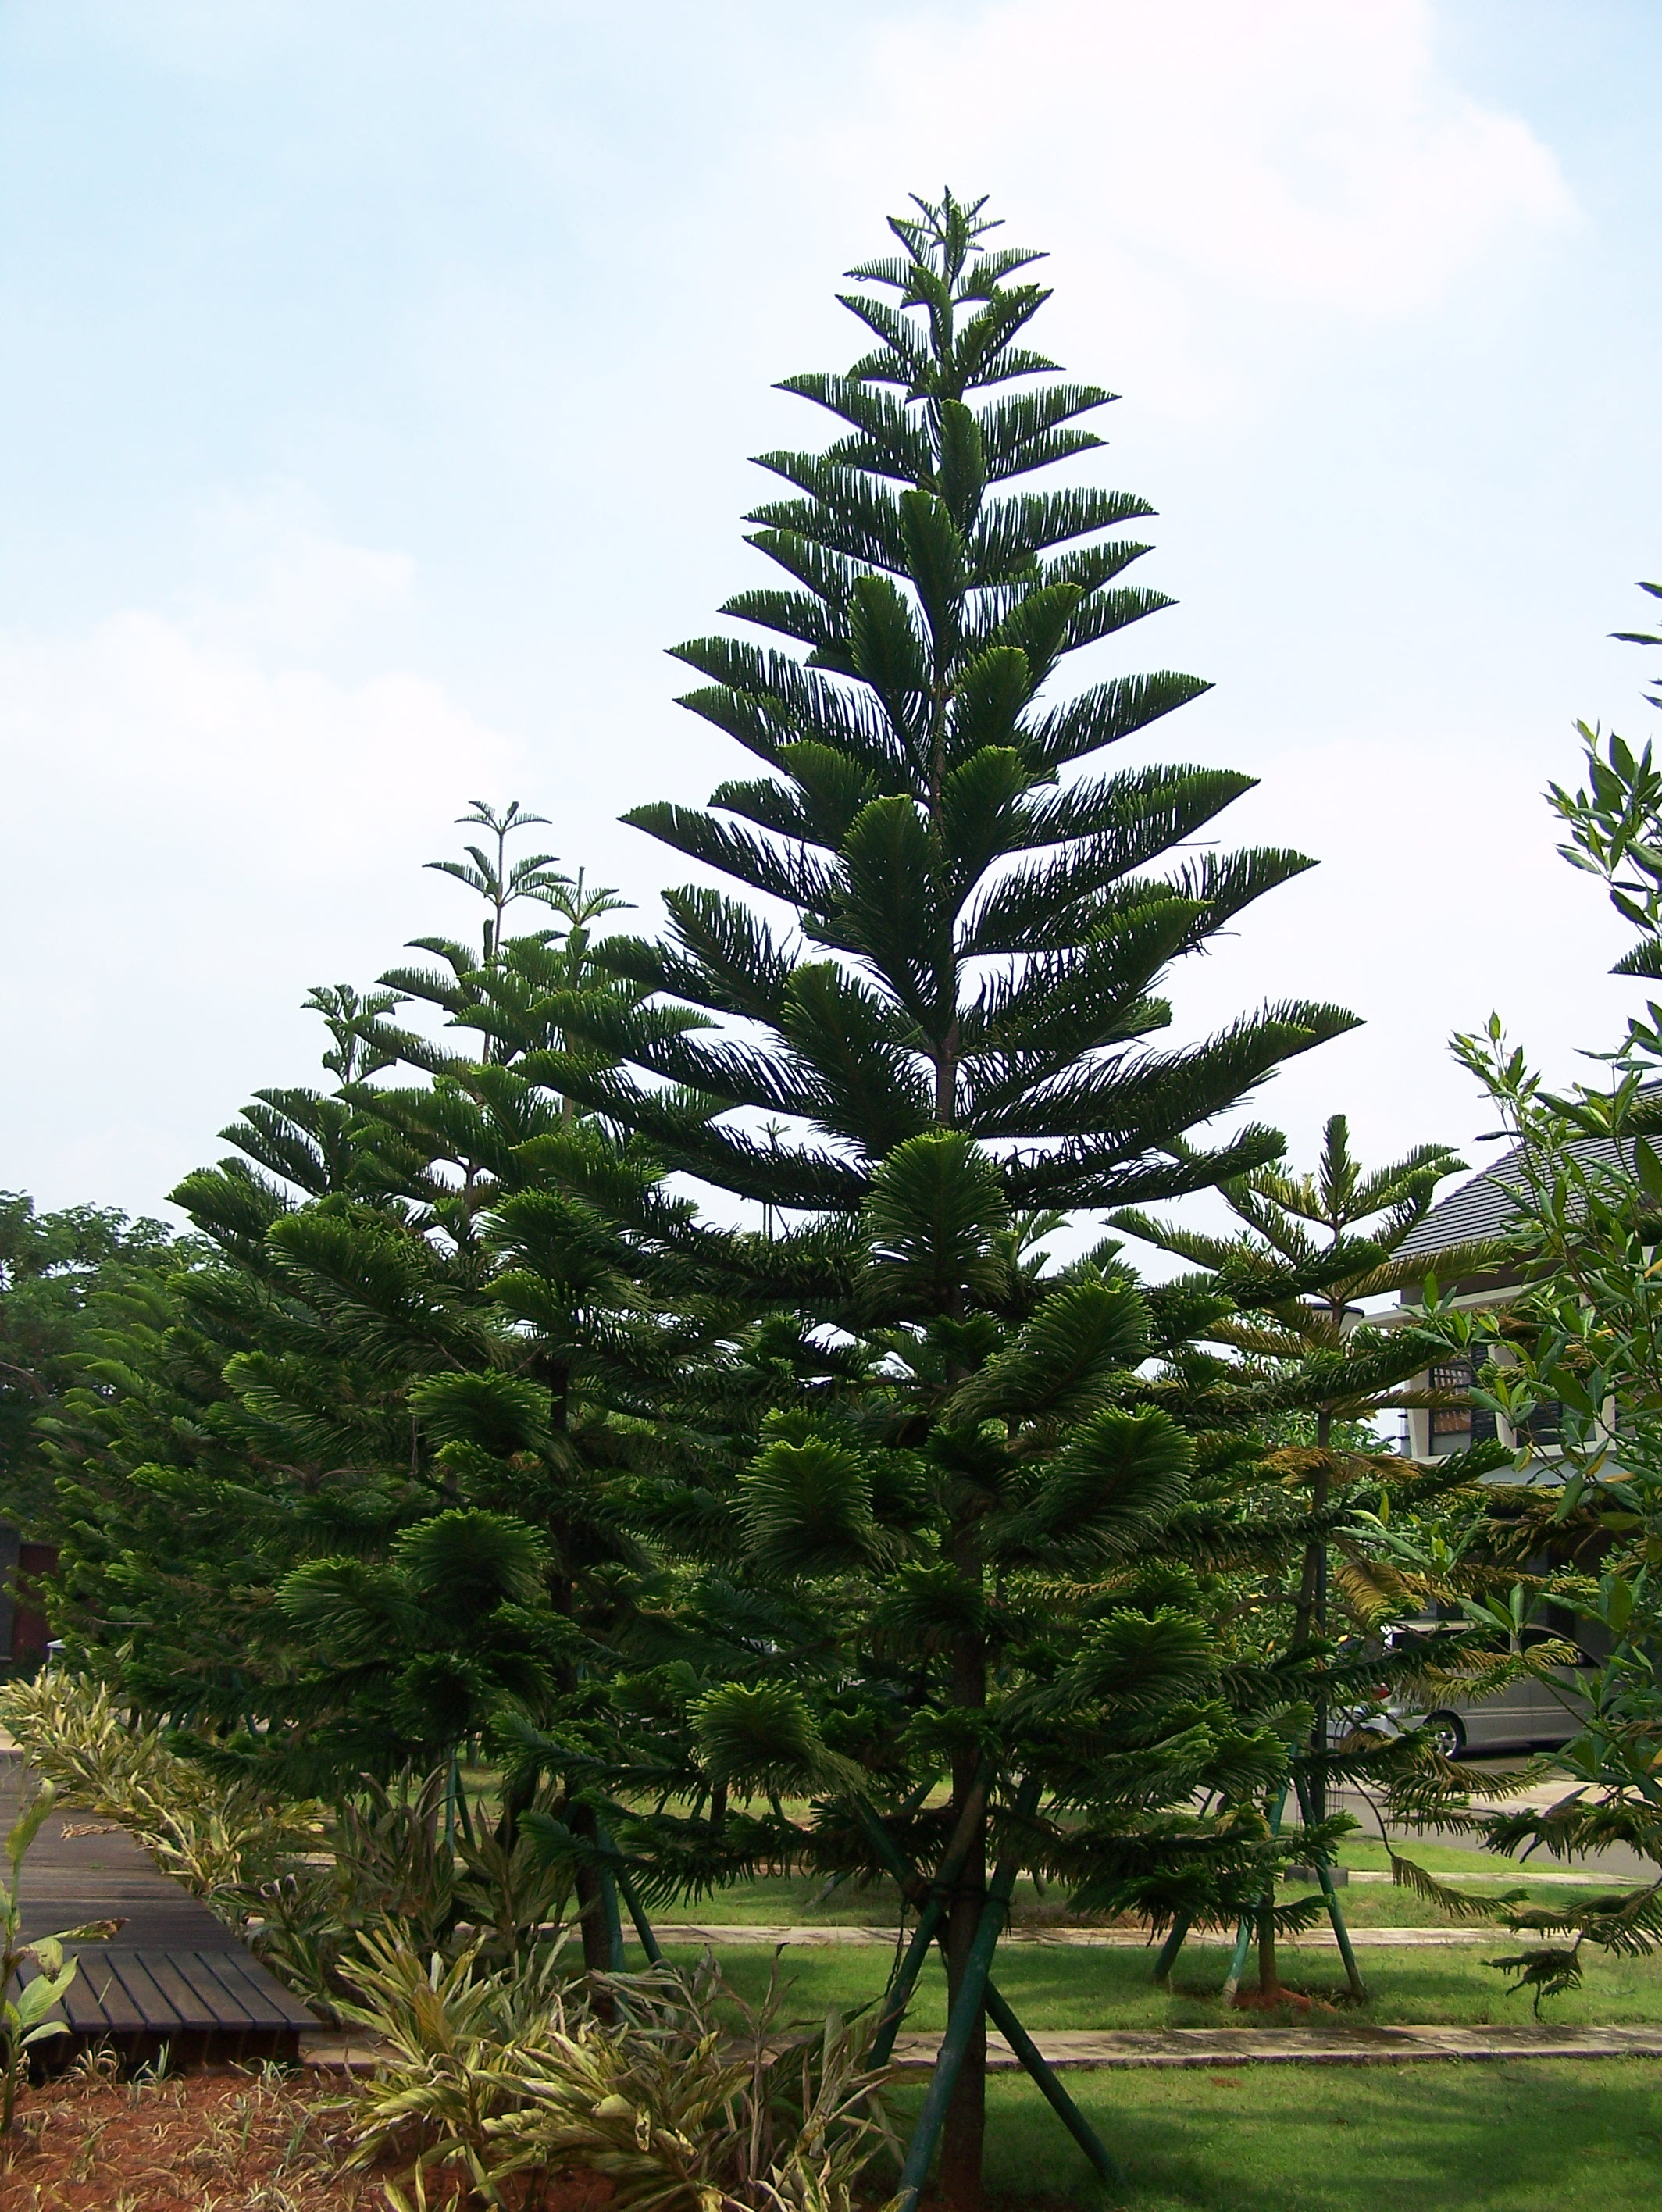 Download 74 Gambar Pohon Cemara Yg Mudah HD Paling Keren